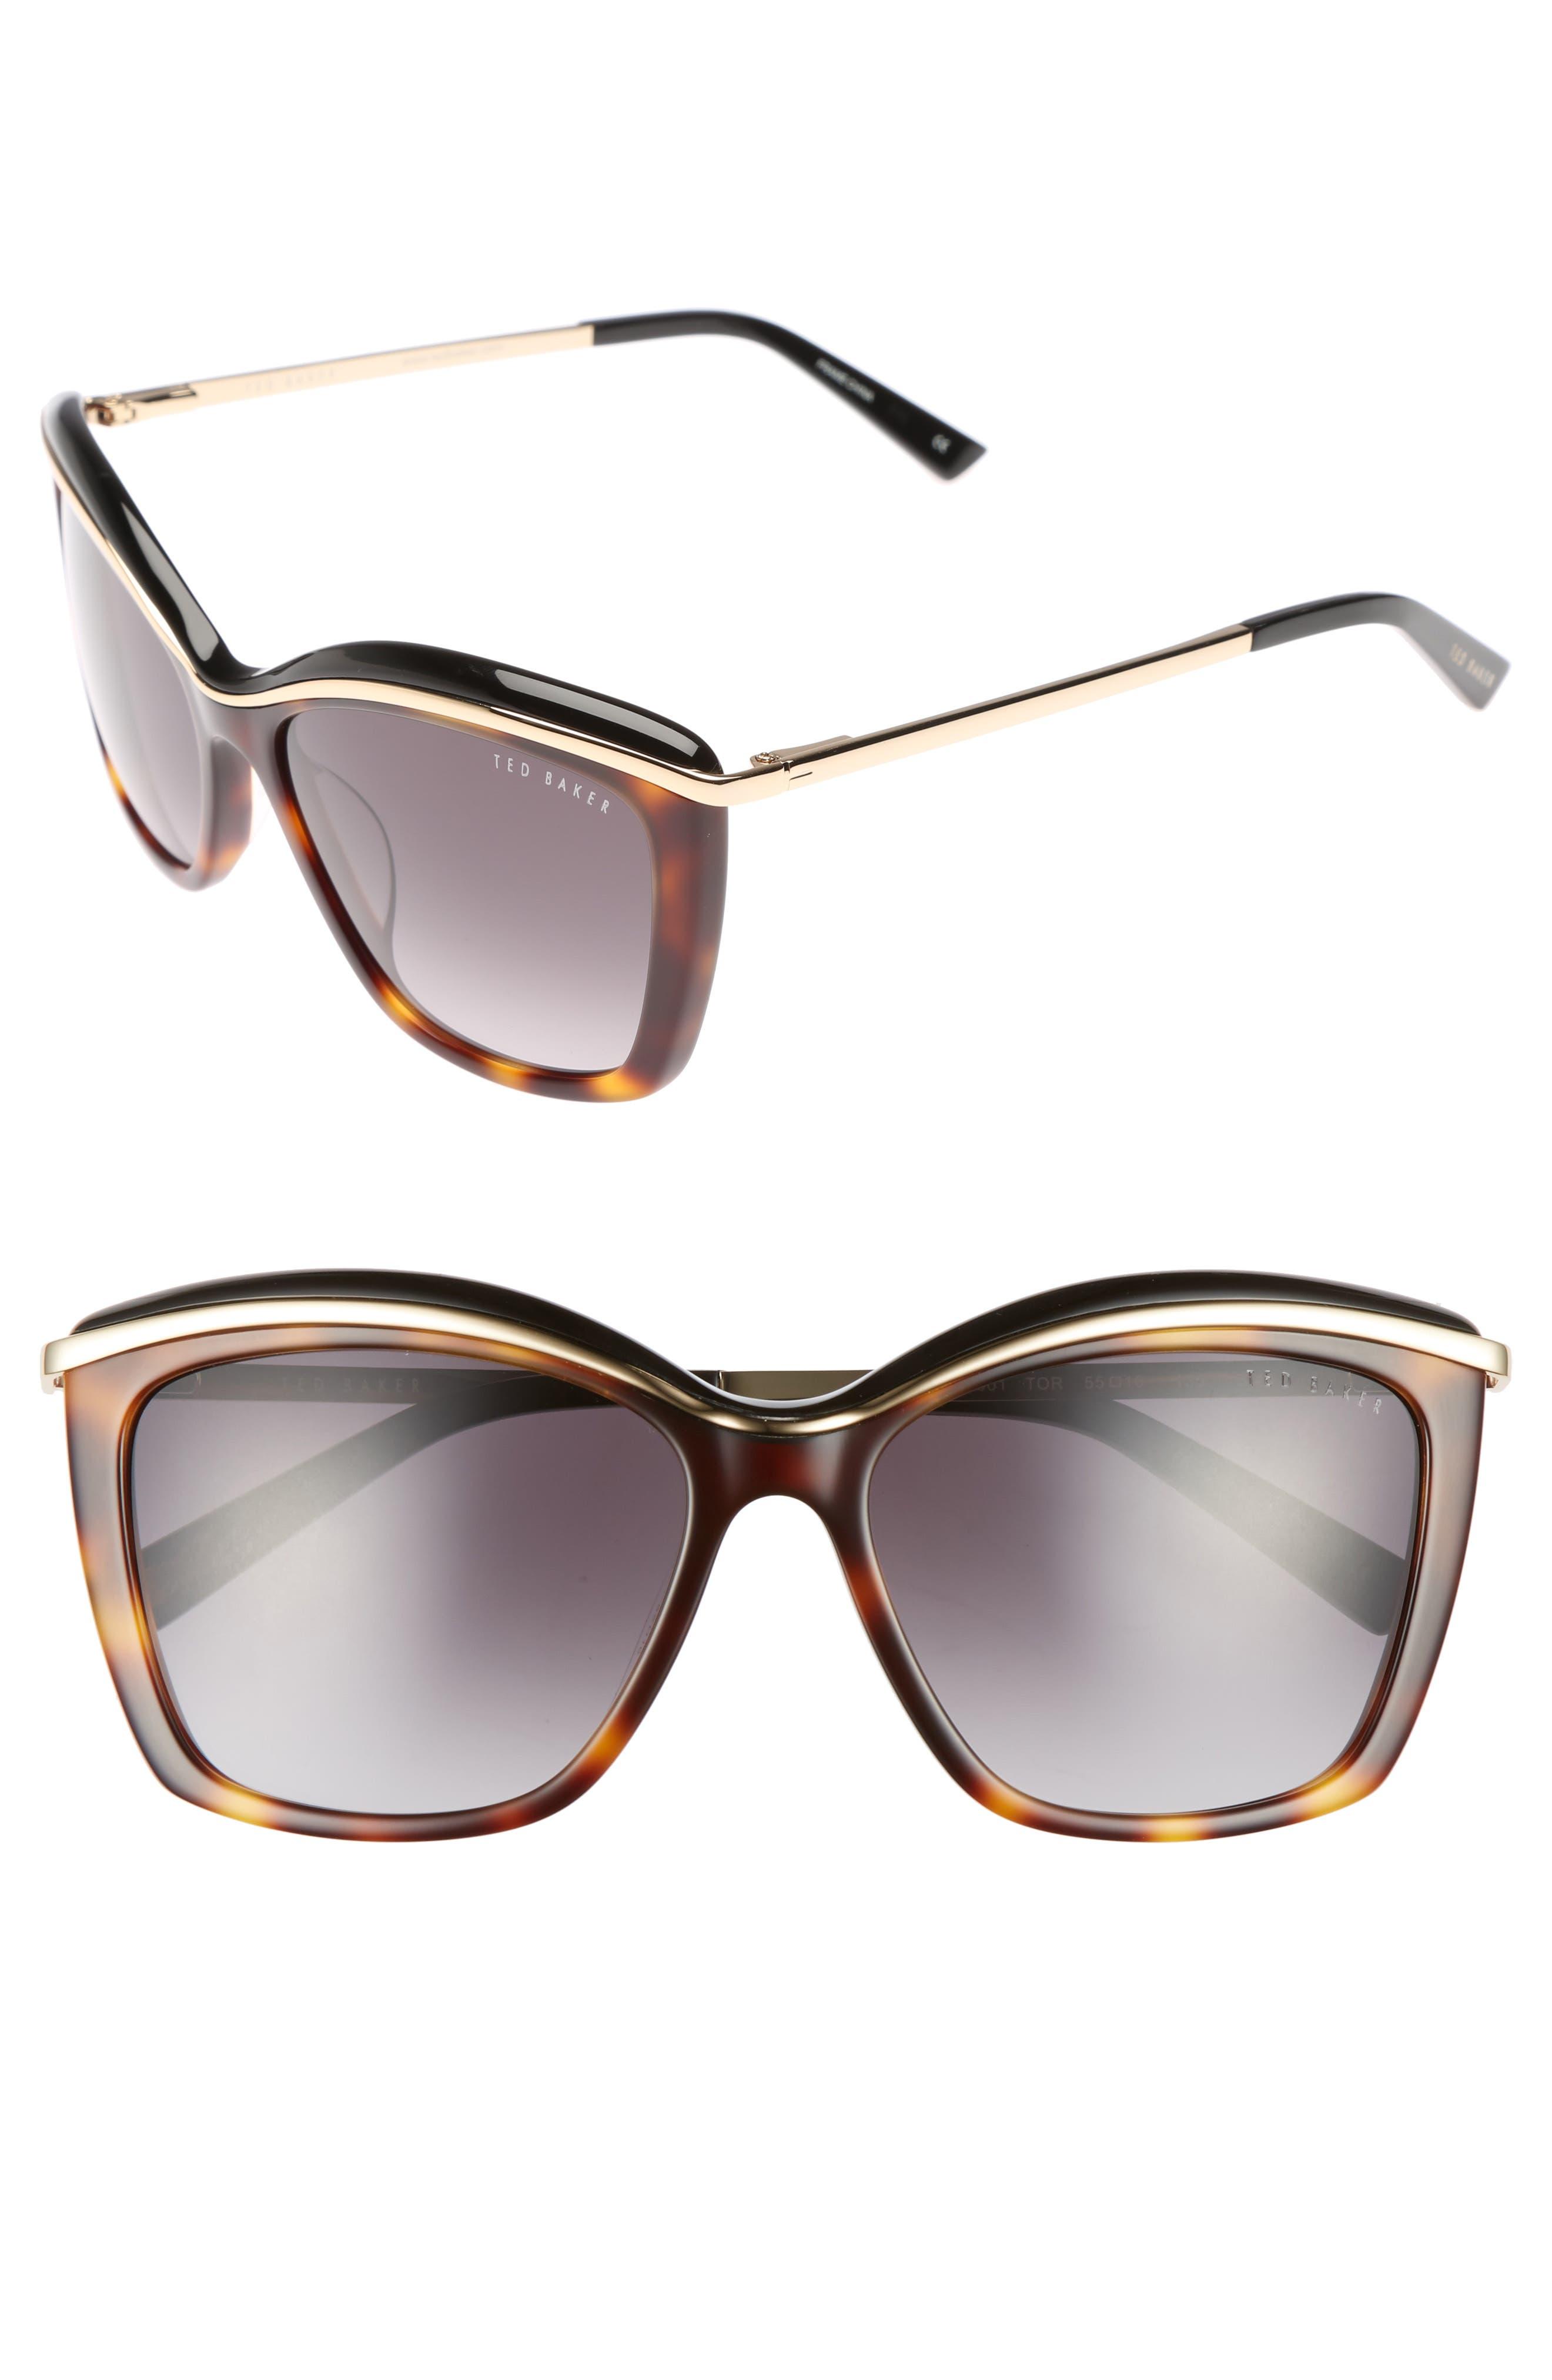 55mm Cat Eye Sunglasses,                         Main,                         color, Tortoise